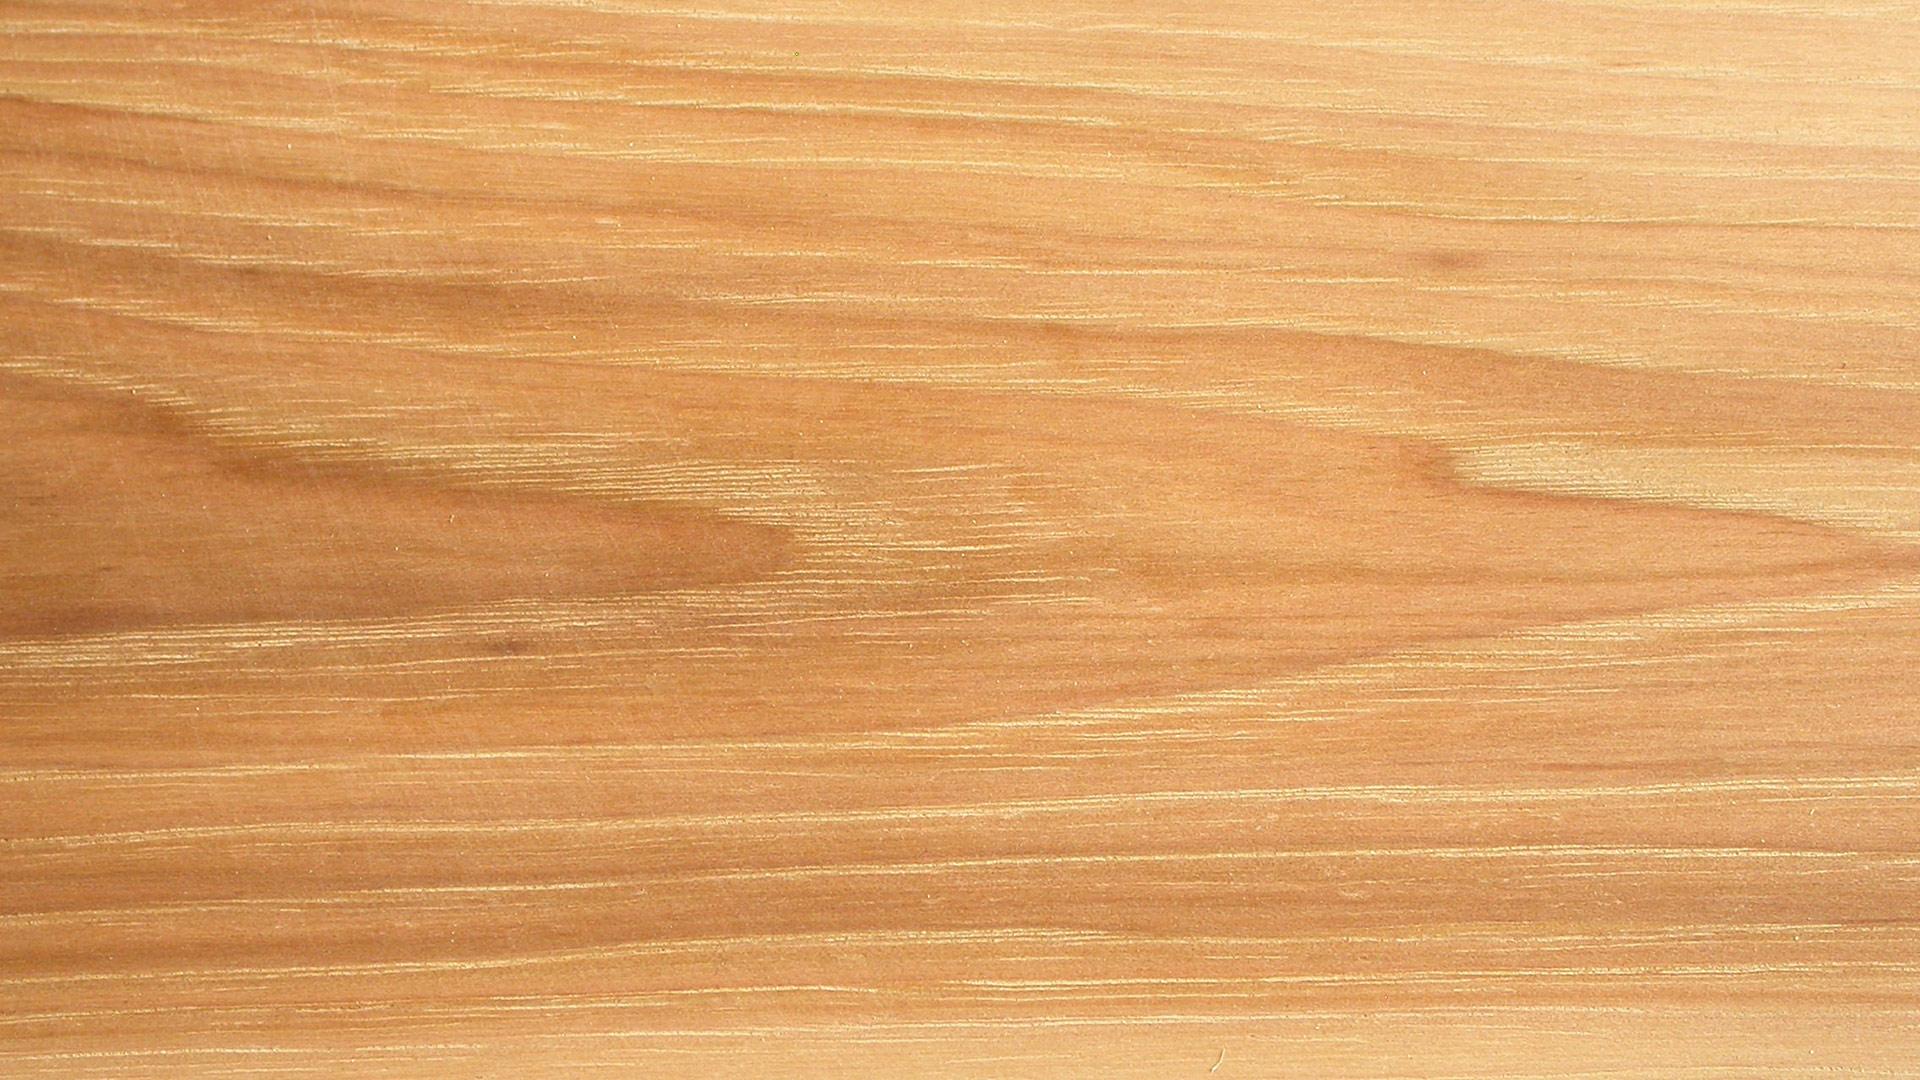 Hickory grain 1920x1080